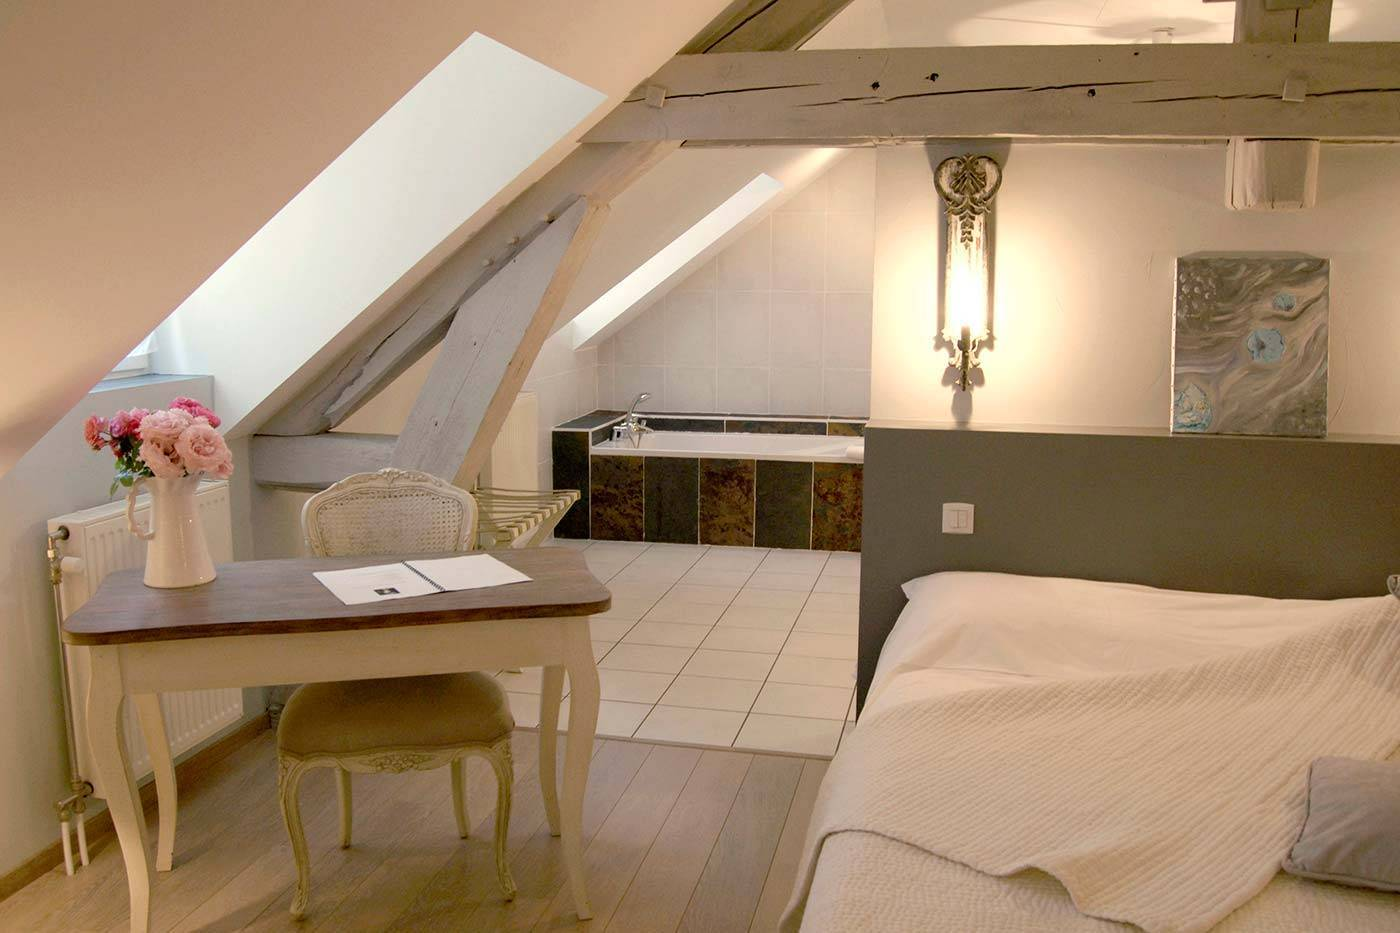 Charm 39 attitude chambre d 39 h te en bourgogne actualit vin par vinotrip - Chambre d hote en bourgogne ...